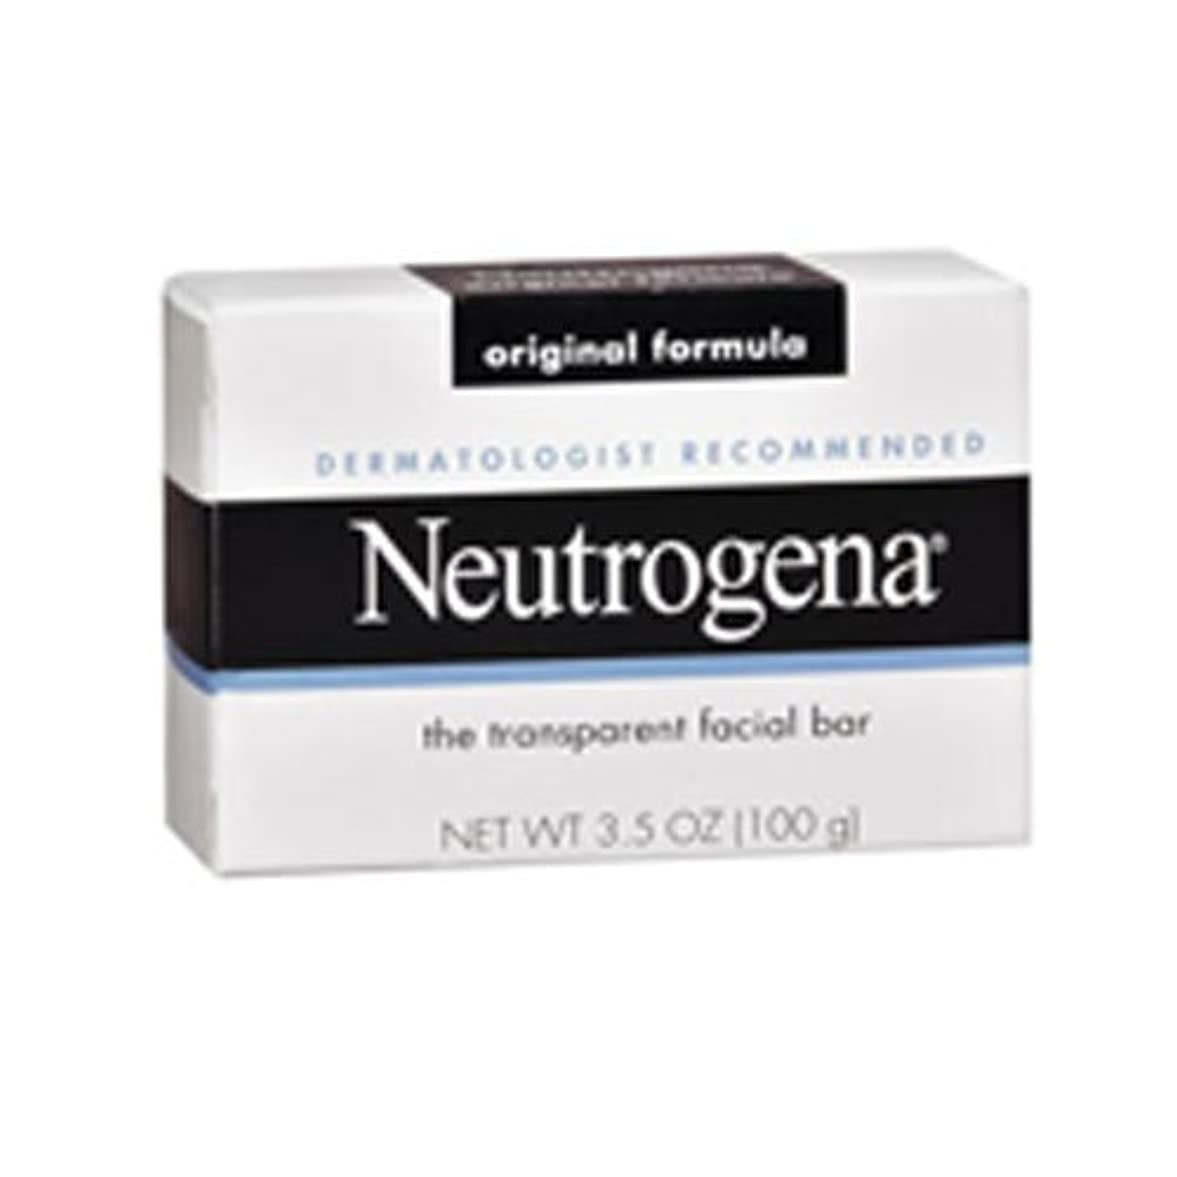 販売計画長椅子隠海外直送肘 Neutrogena Transparent Facial Soap Bar, 3.5 oz